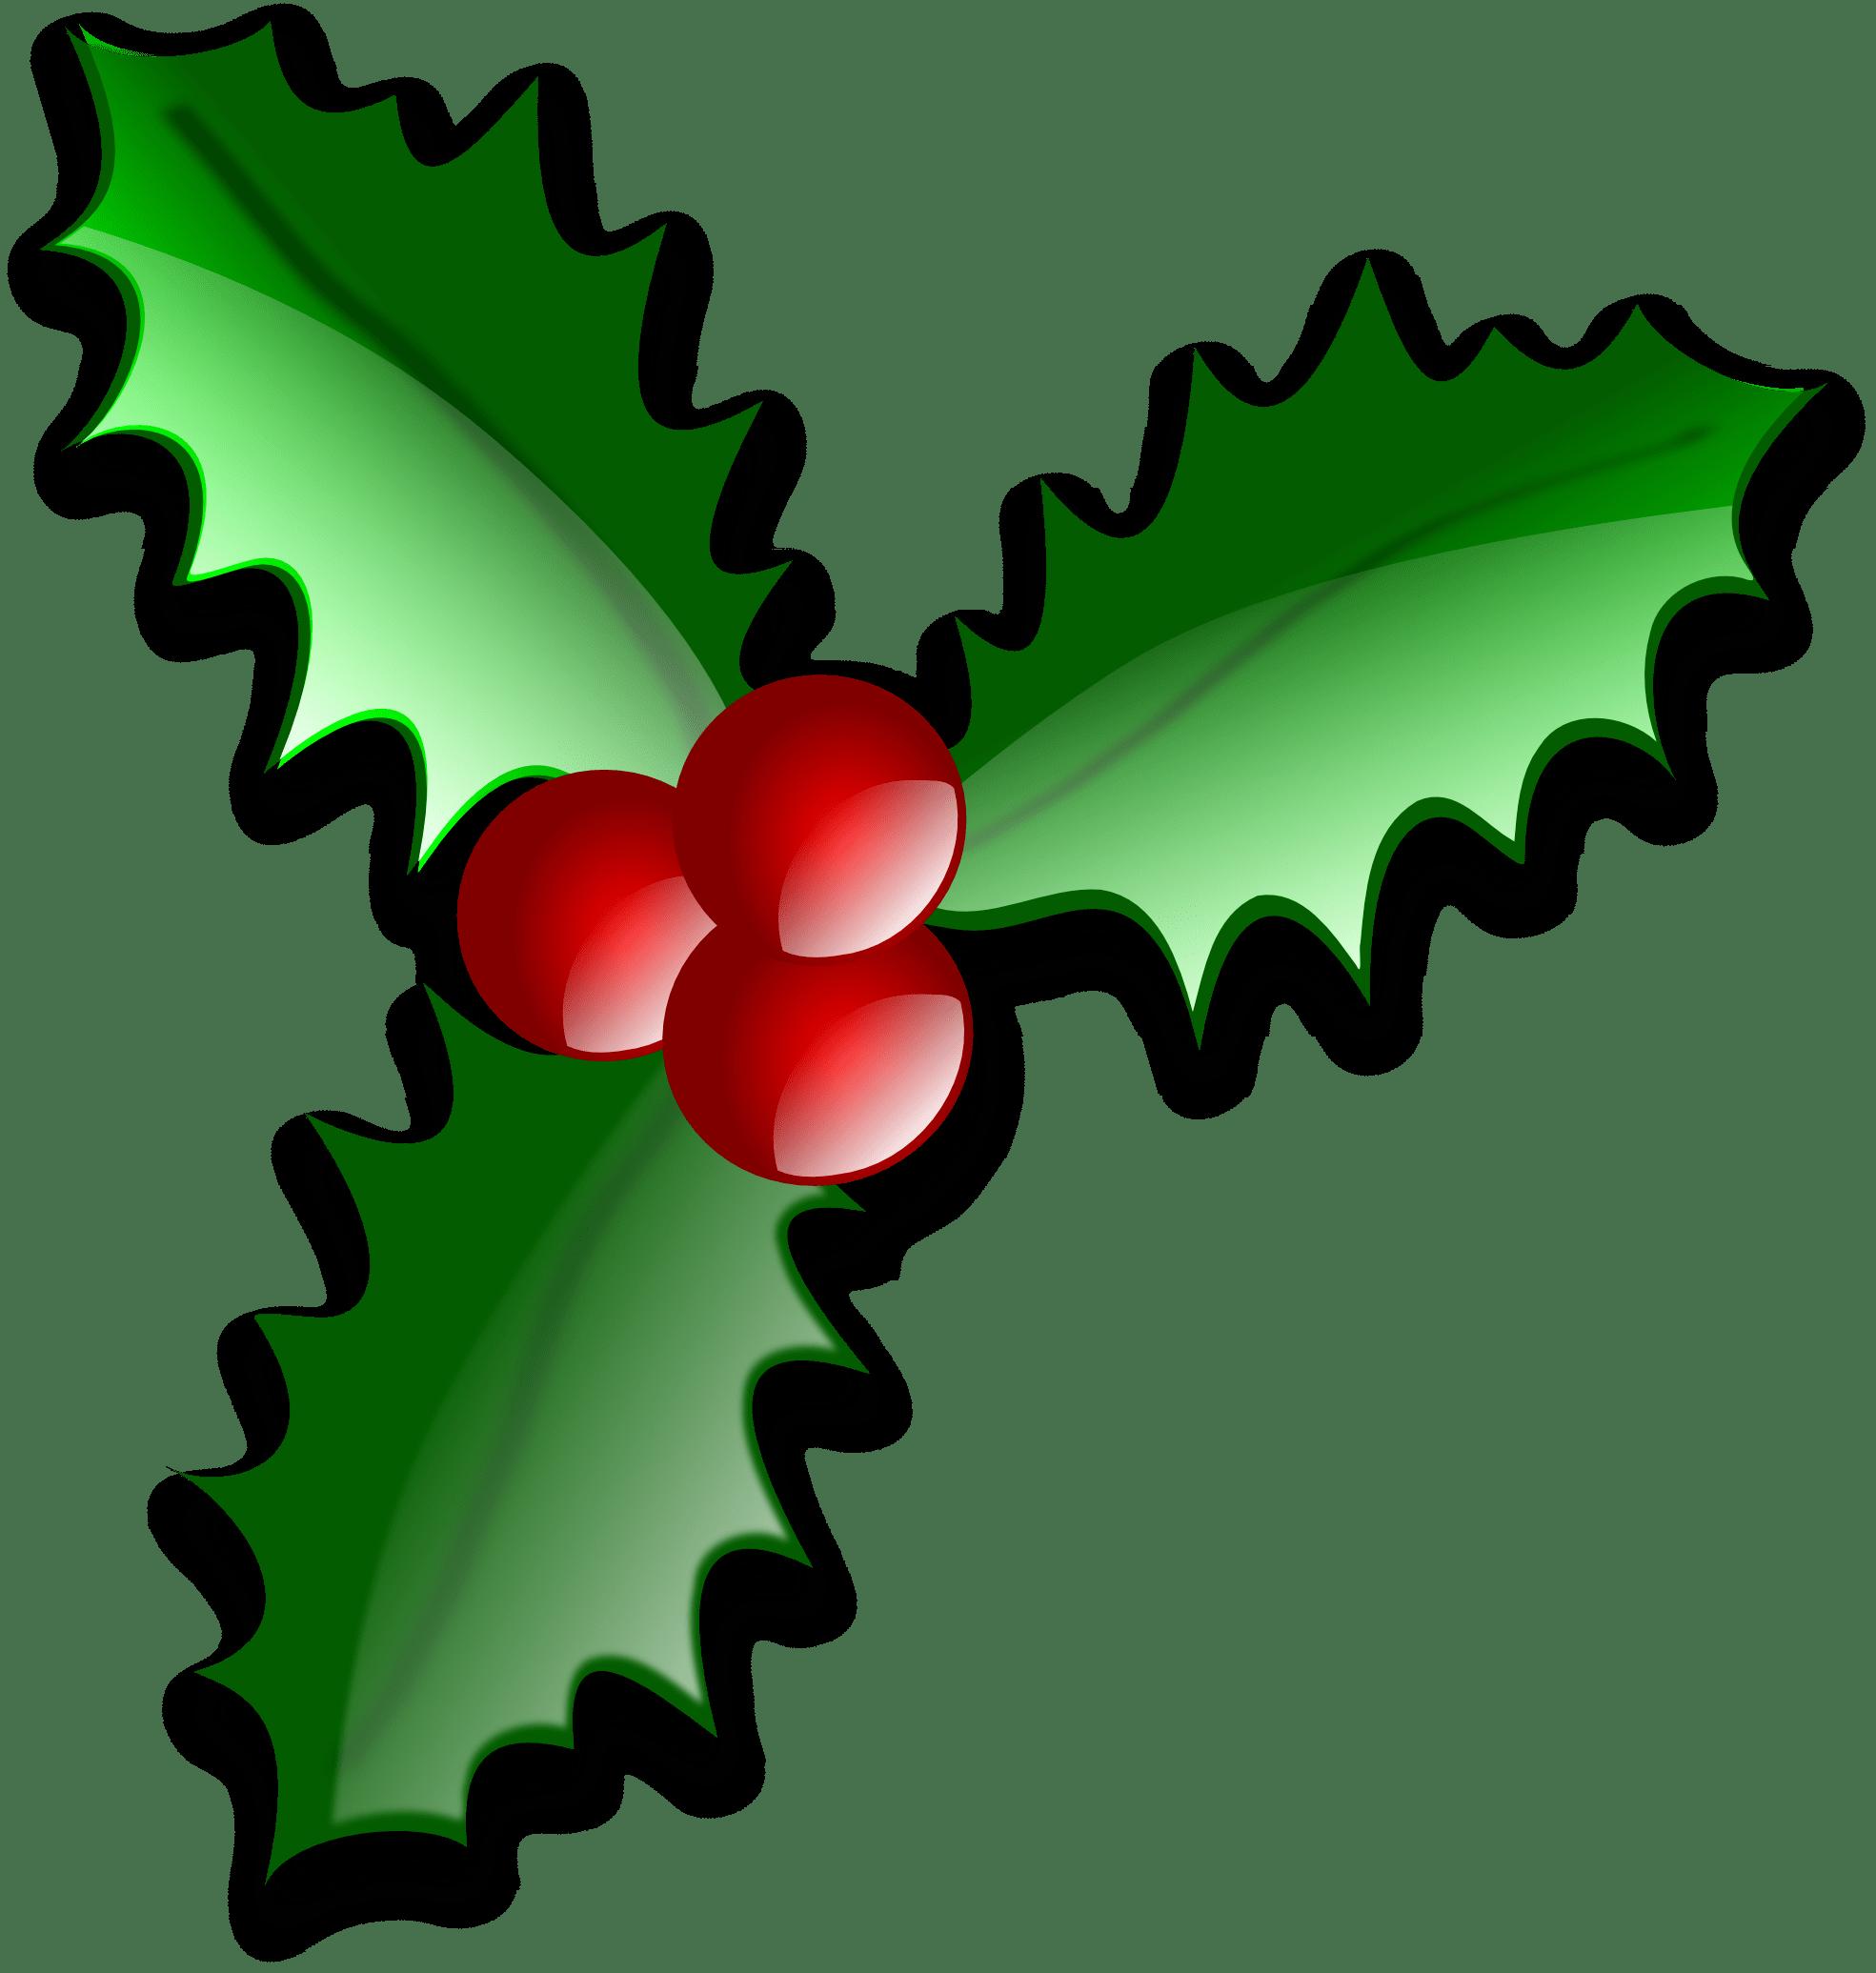 Festive clipart clip black and white download Christmas festive clipart 5 » Clipart Portal clip black and white download